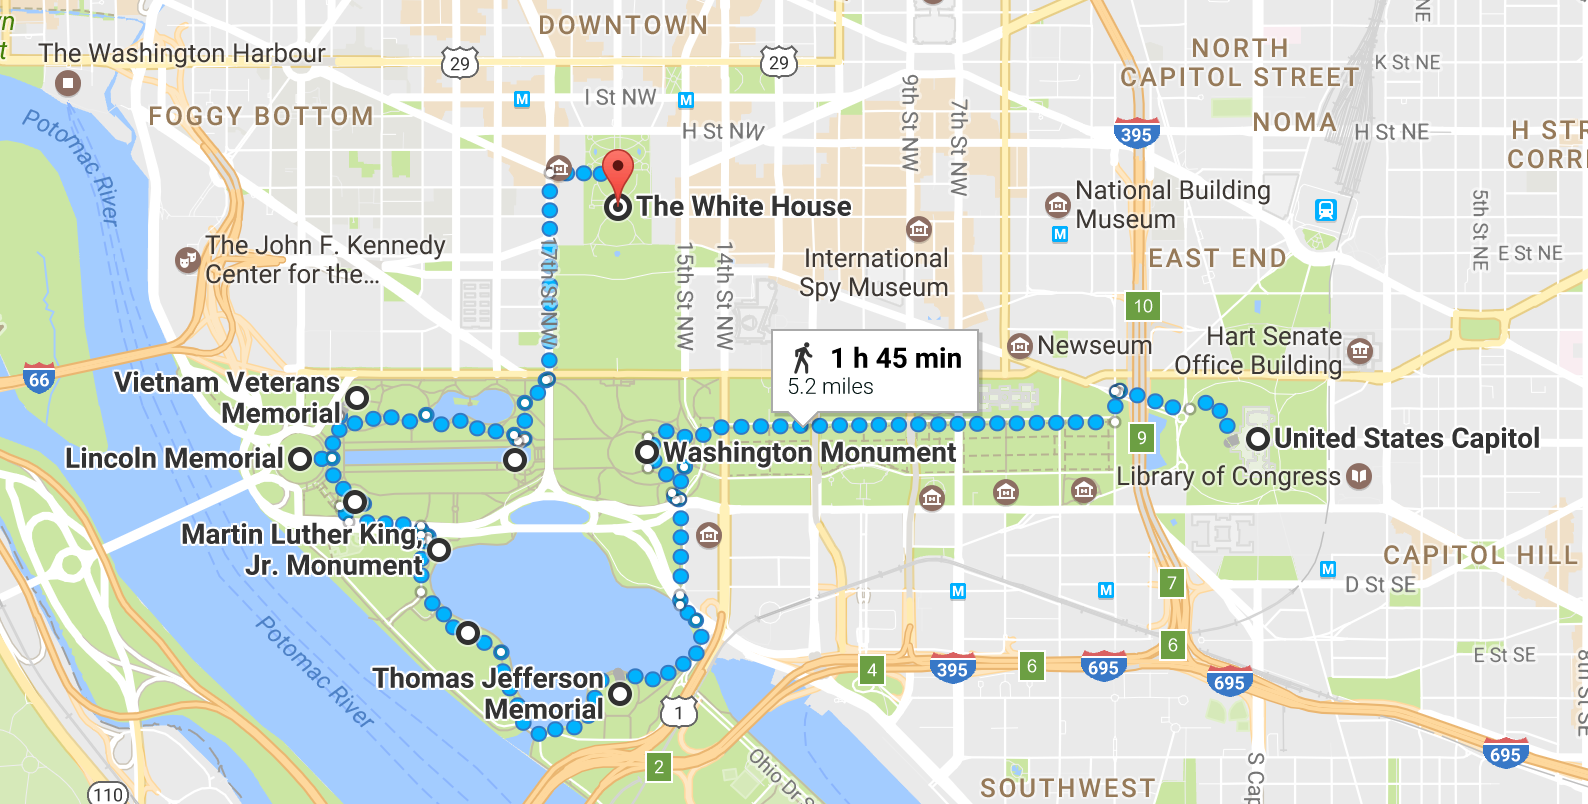 Washington Dc Attractions Map PDF - FREE Printable Tourist ... on dc art map, jw marriott dc map, dc wedding map, dc topo map, dc race map, dc sightseeing map, dc maps printable, dc interactive map, dc food map, dc train map, dc road map, dc metro map, dc us map, dc guide map, dc city map, dc bus map, wa dc map, dc park map, dc museum map, d.c. map,